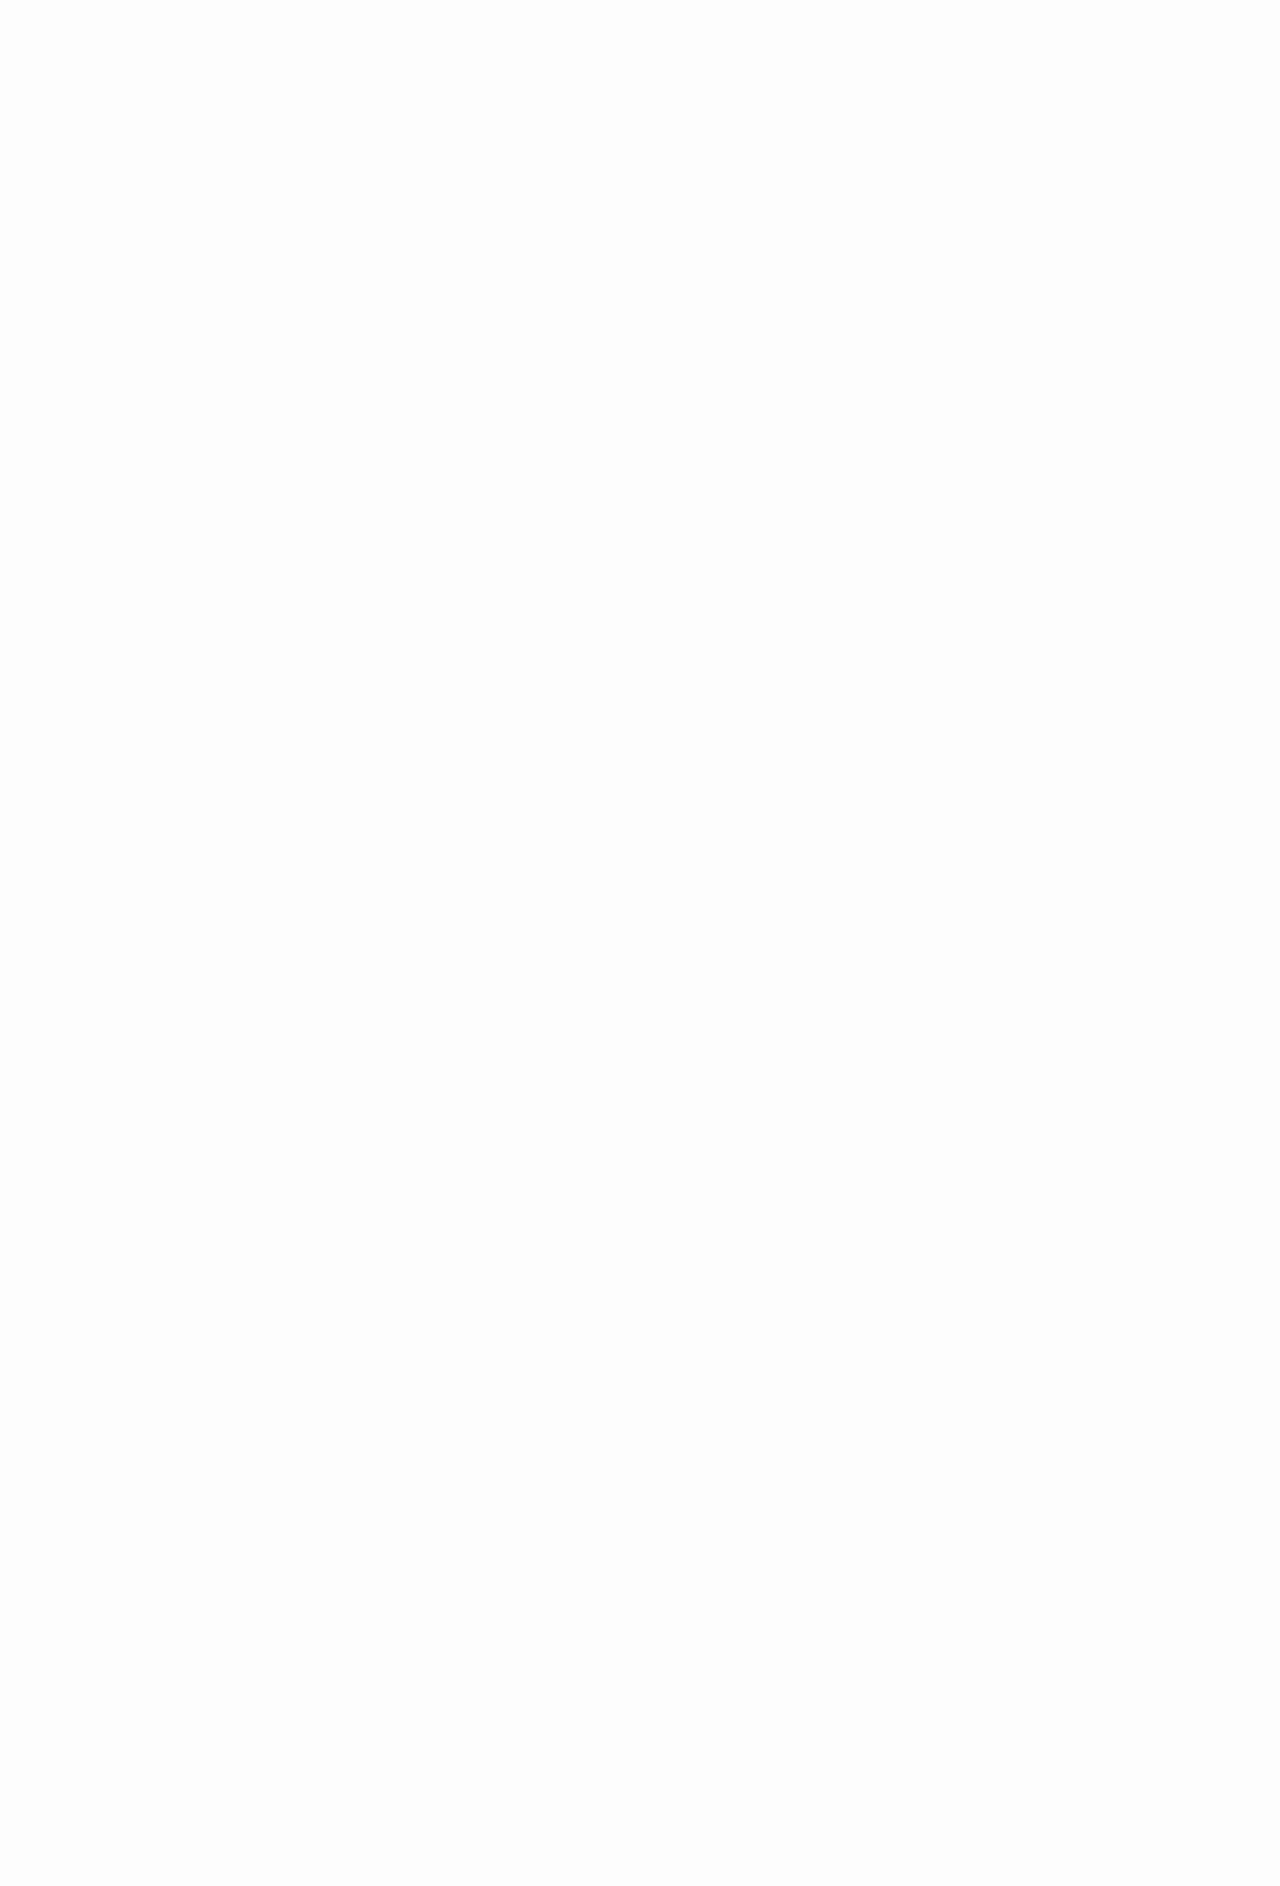 (C90) [The Dungeon in Yarn (Yone Kinji)] Mahou Shoujo wa Mahou Tsukai (30-sai Doutei) o Taosu no ga Oshigoto desu | It's a Magical Girl's Duty to Kill Wizards (30y virgins) [English] [Chastity Dreamer Schmö] 26